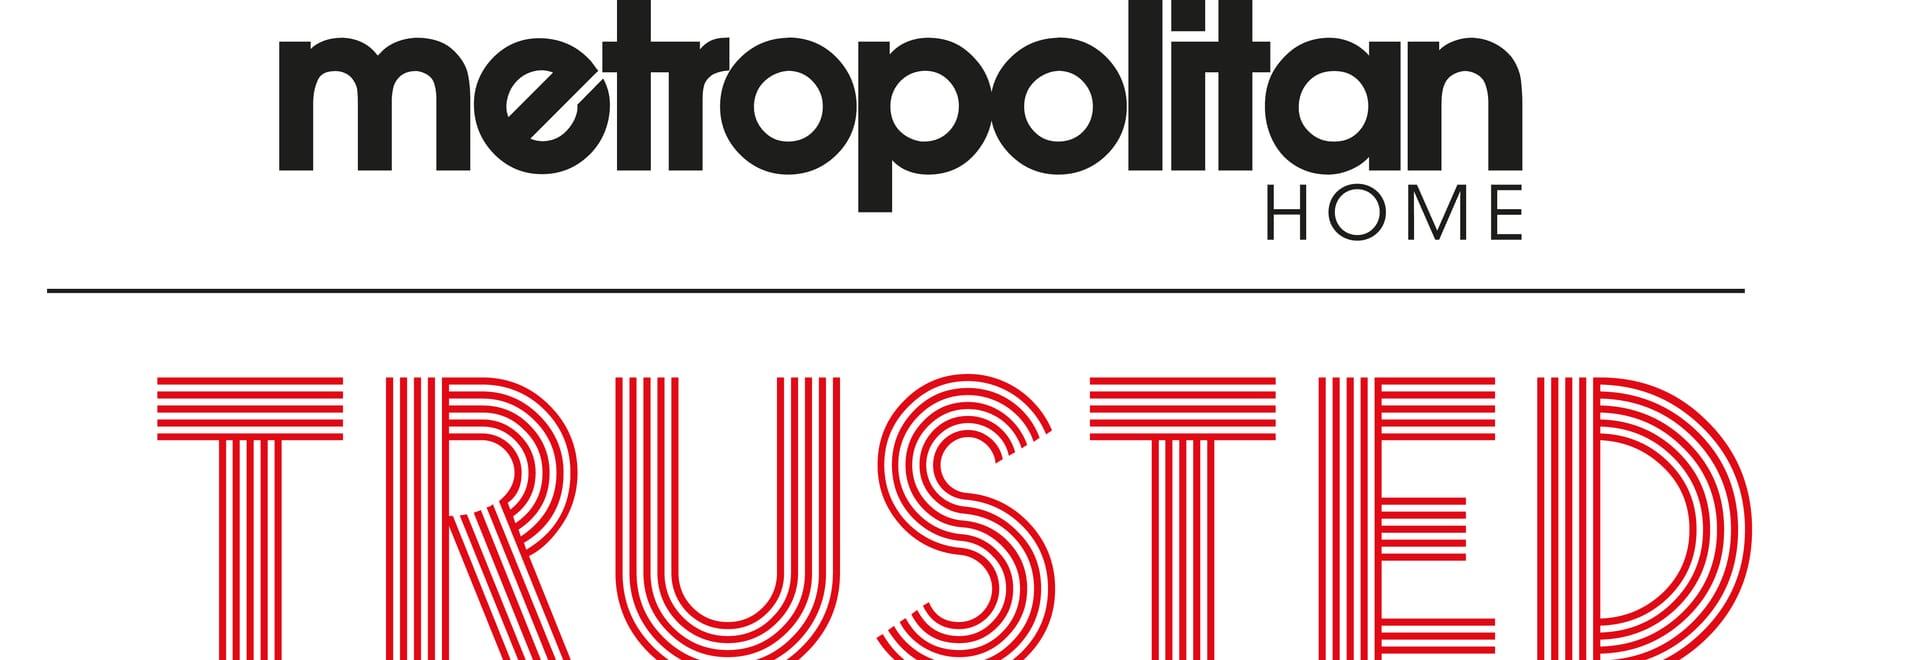 Metropolitan Home Trusted Brand Awards 2017